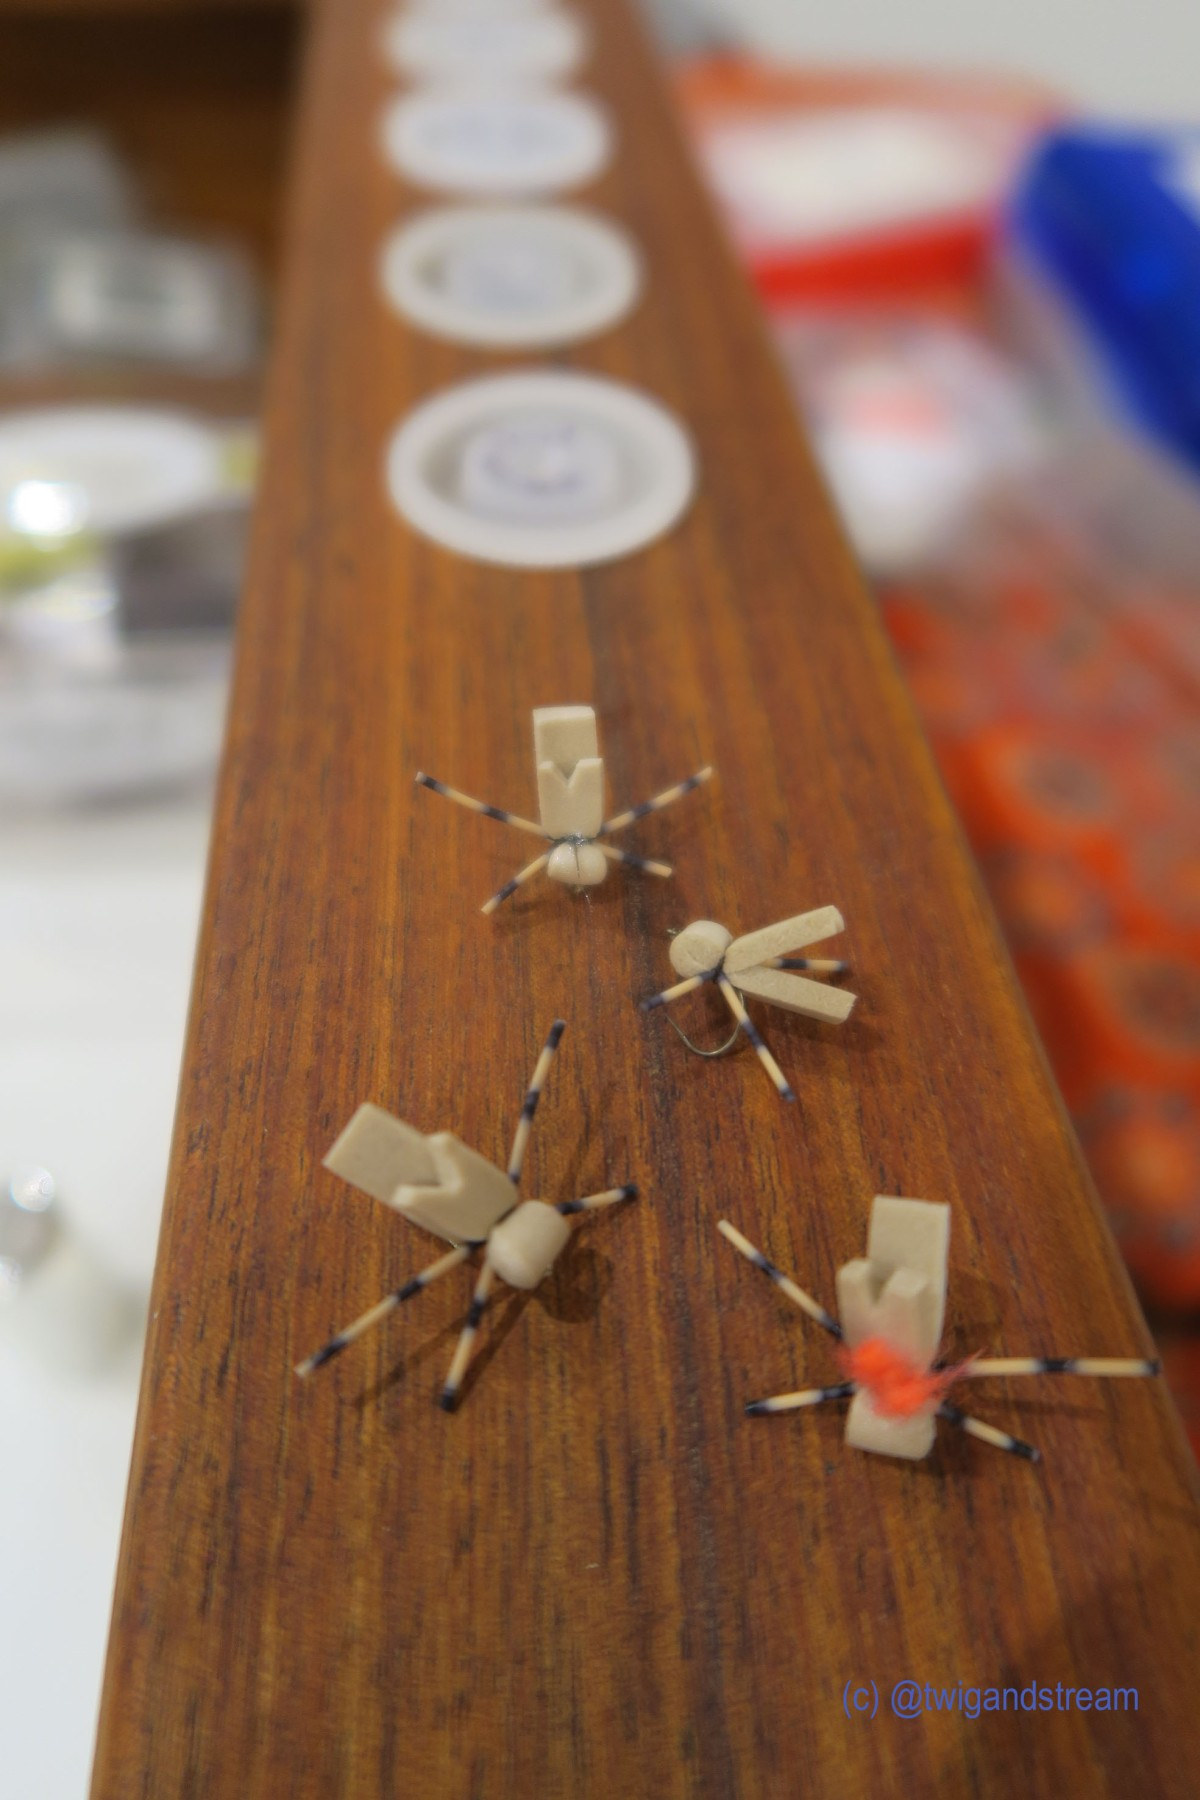 Tying a simplehopper